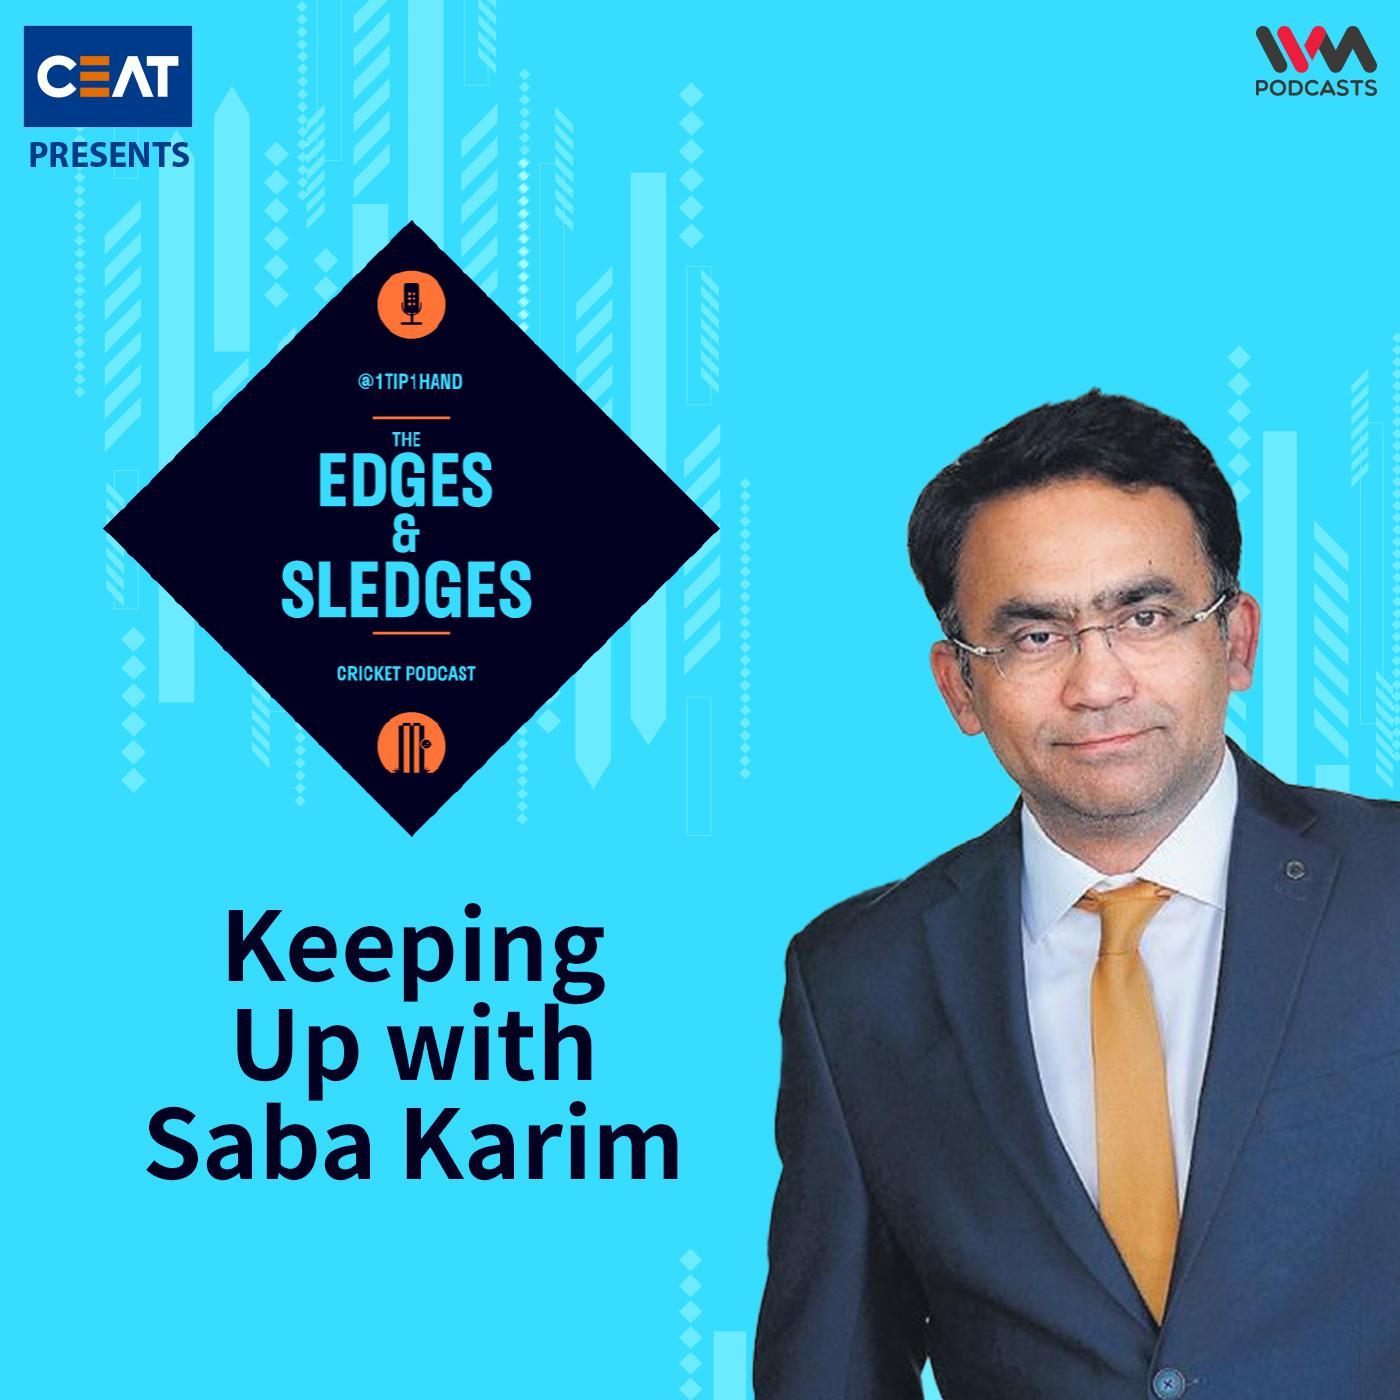 Ep. 177: Keeping Up with Saba Karim